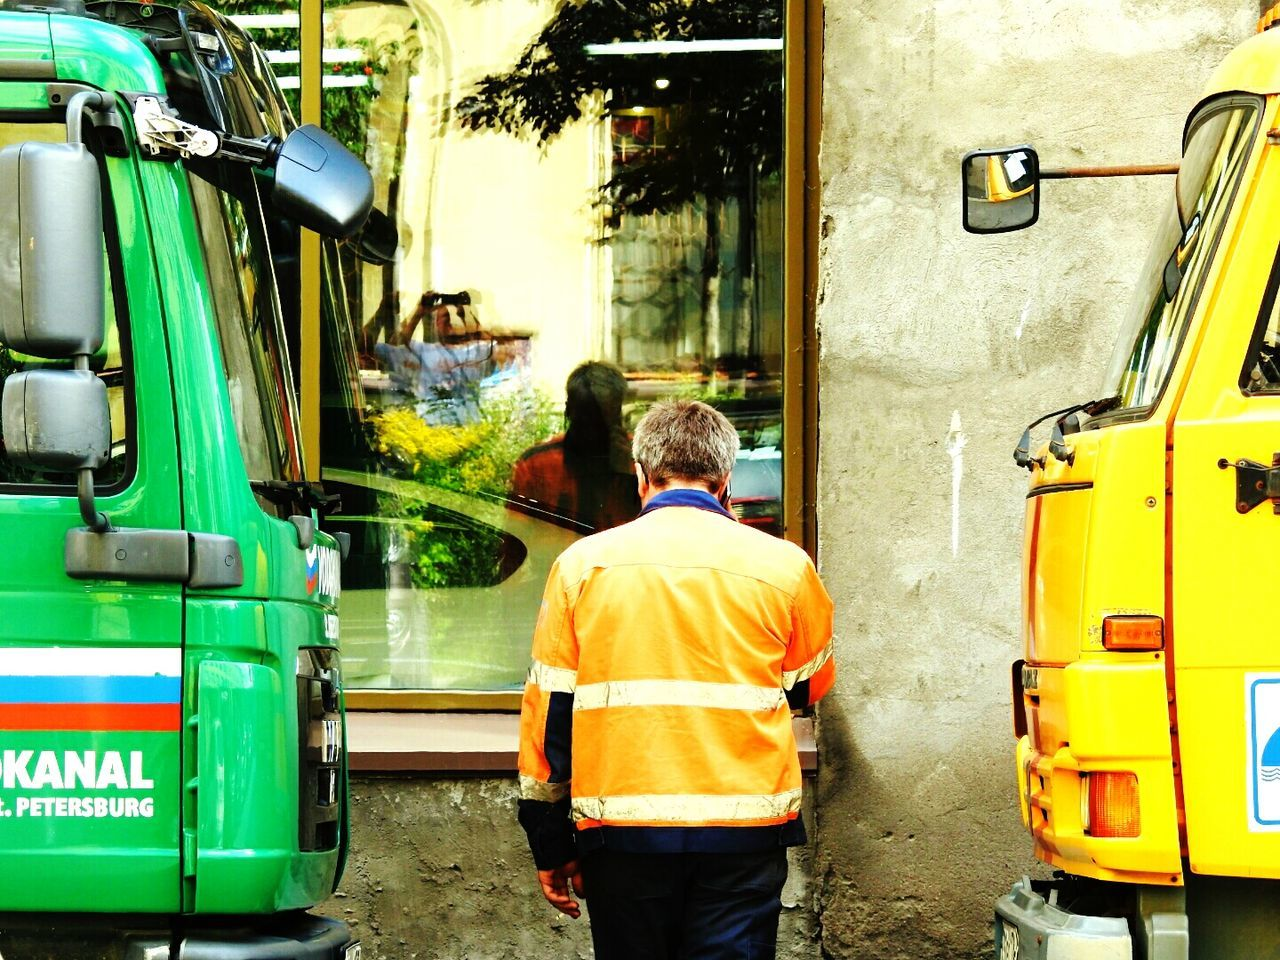 Water Treatment Worker Call Special Transport Sankt-peterburg Russian Green&yellow